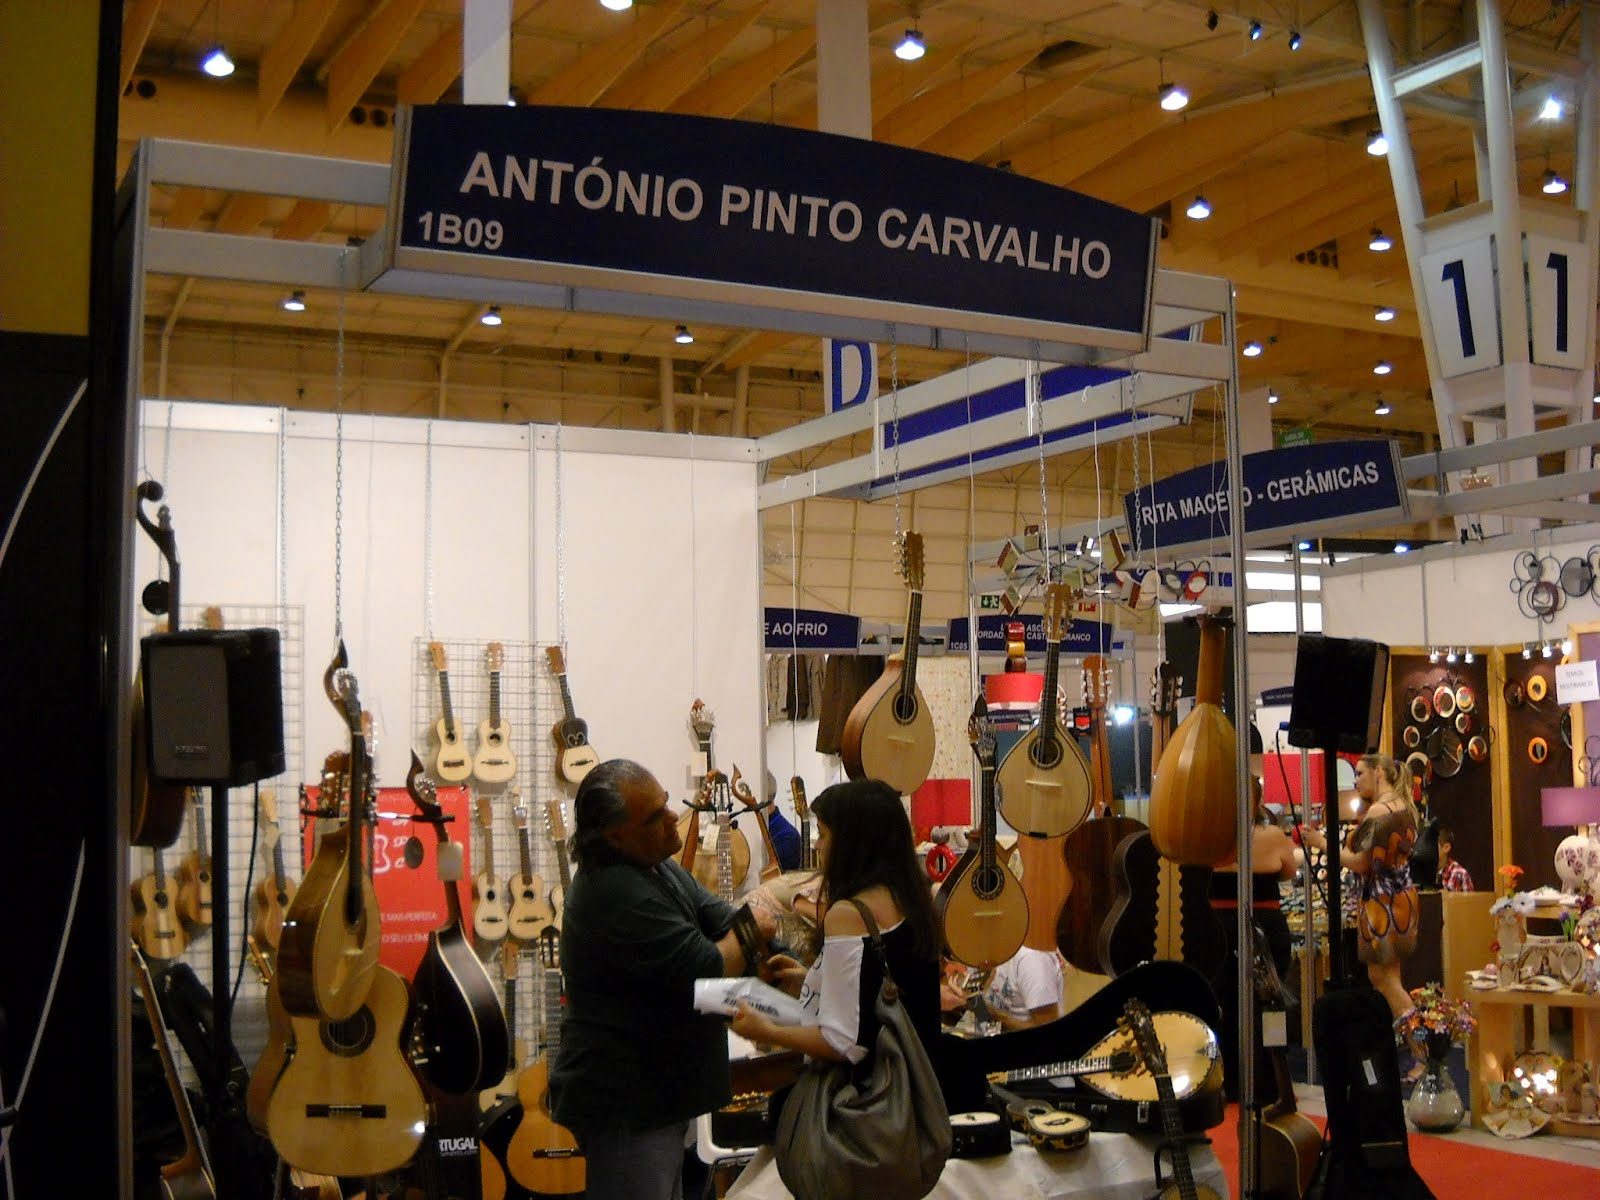 Artesanato Junino Facil ~ TRADICIONALIS FEIRA INTERNACIONAL DE ARTESANATO DE LISBOA ANTÓNIO PINTO CARVALHO